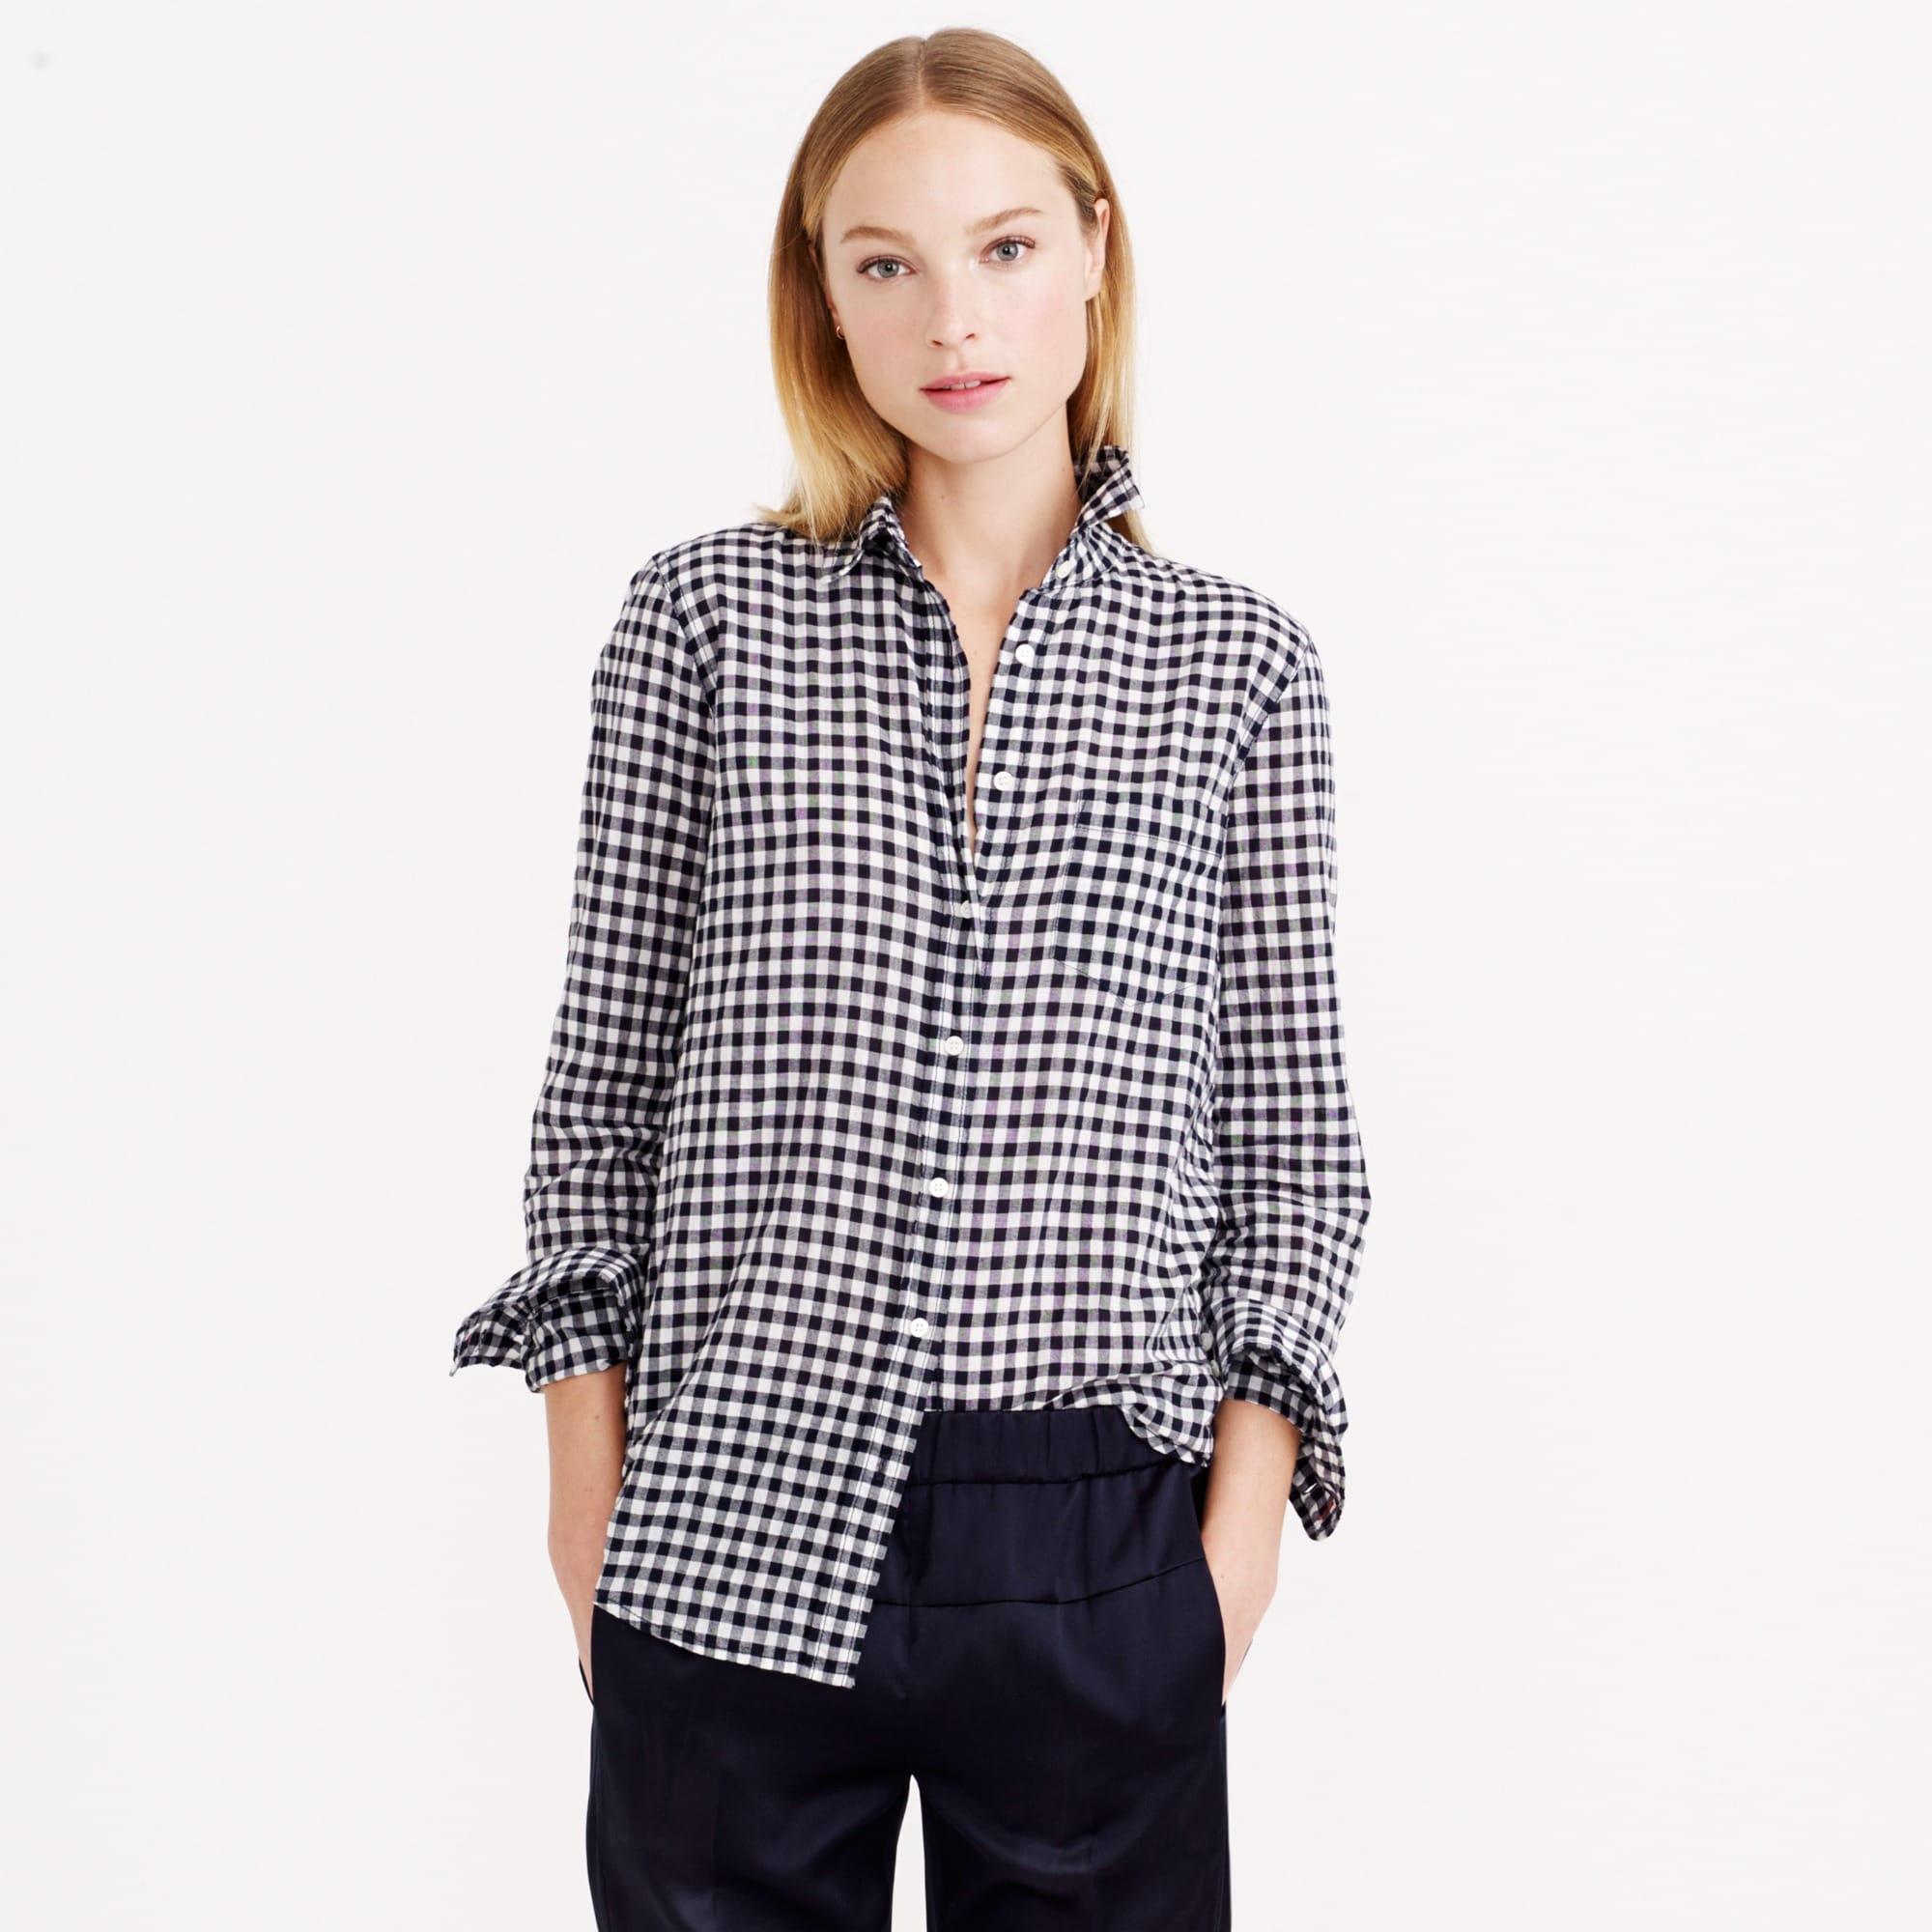 Image 2 for Crinkle check shirt